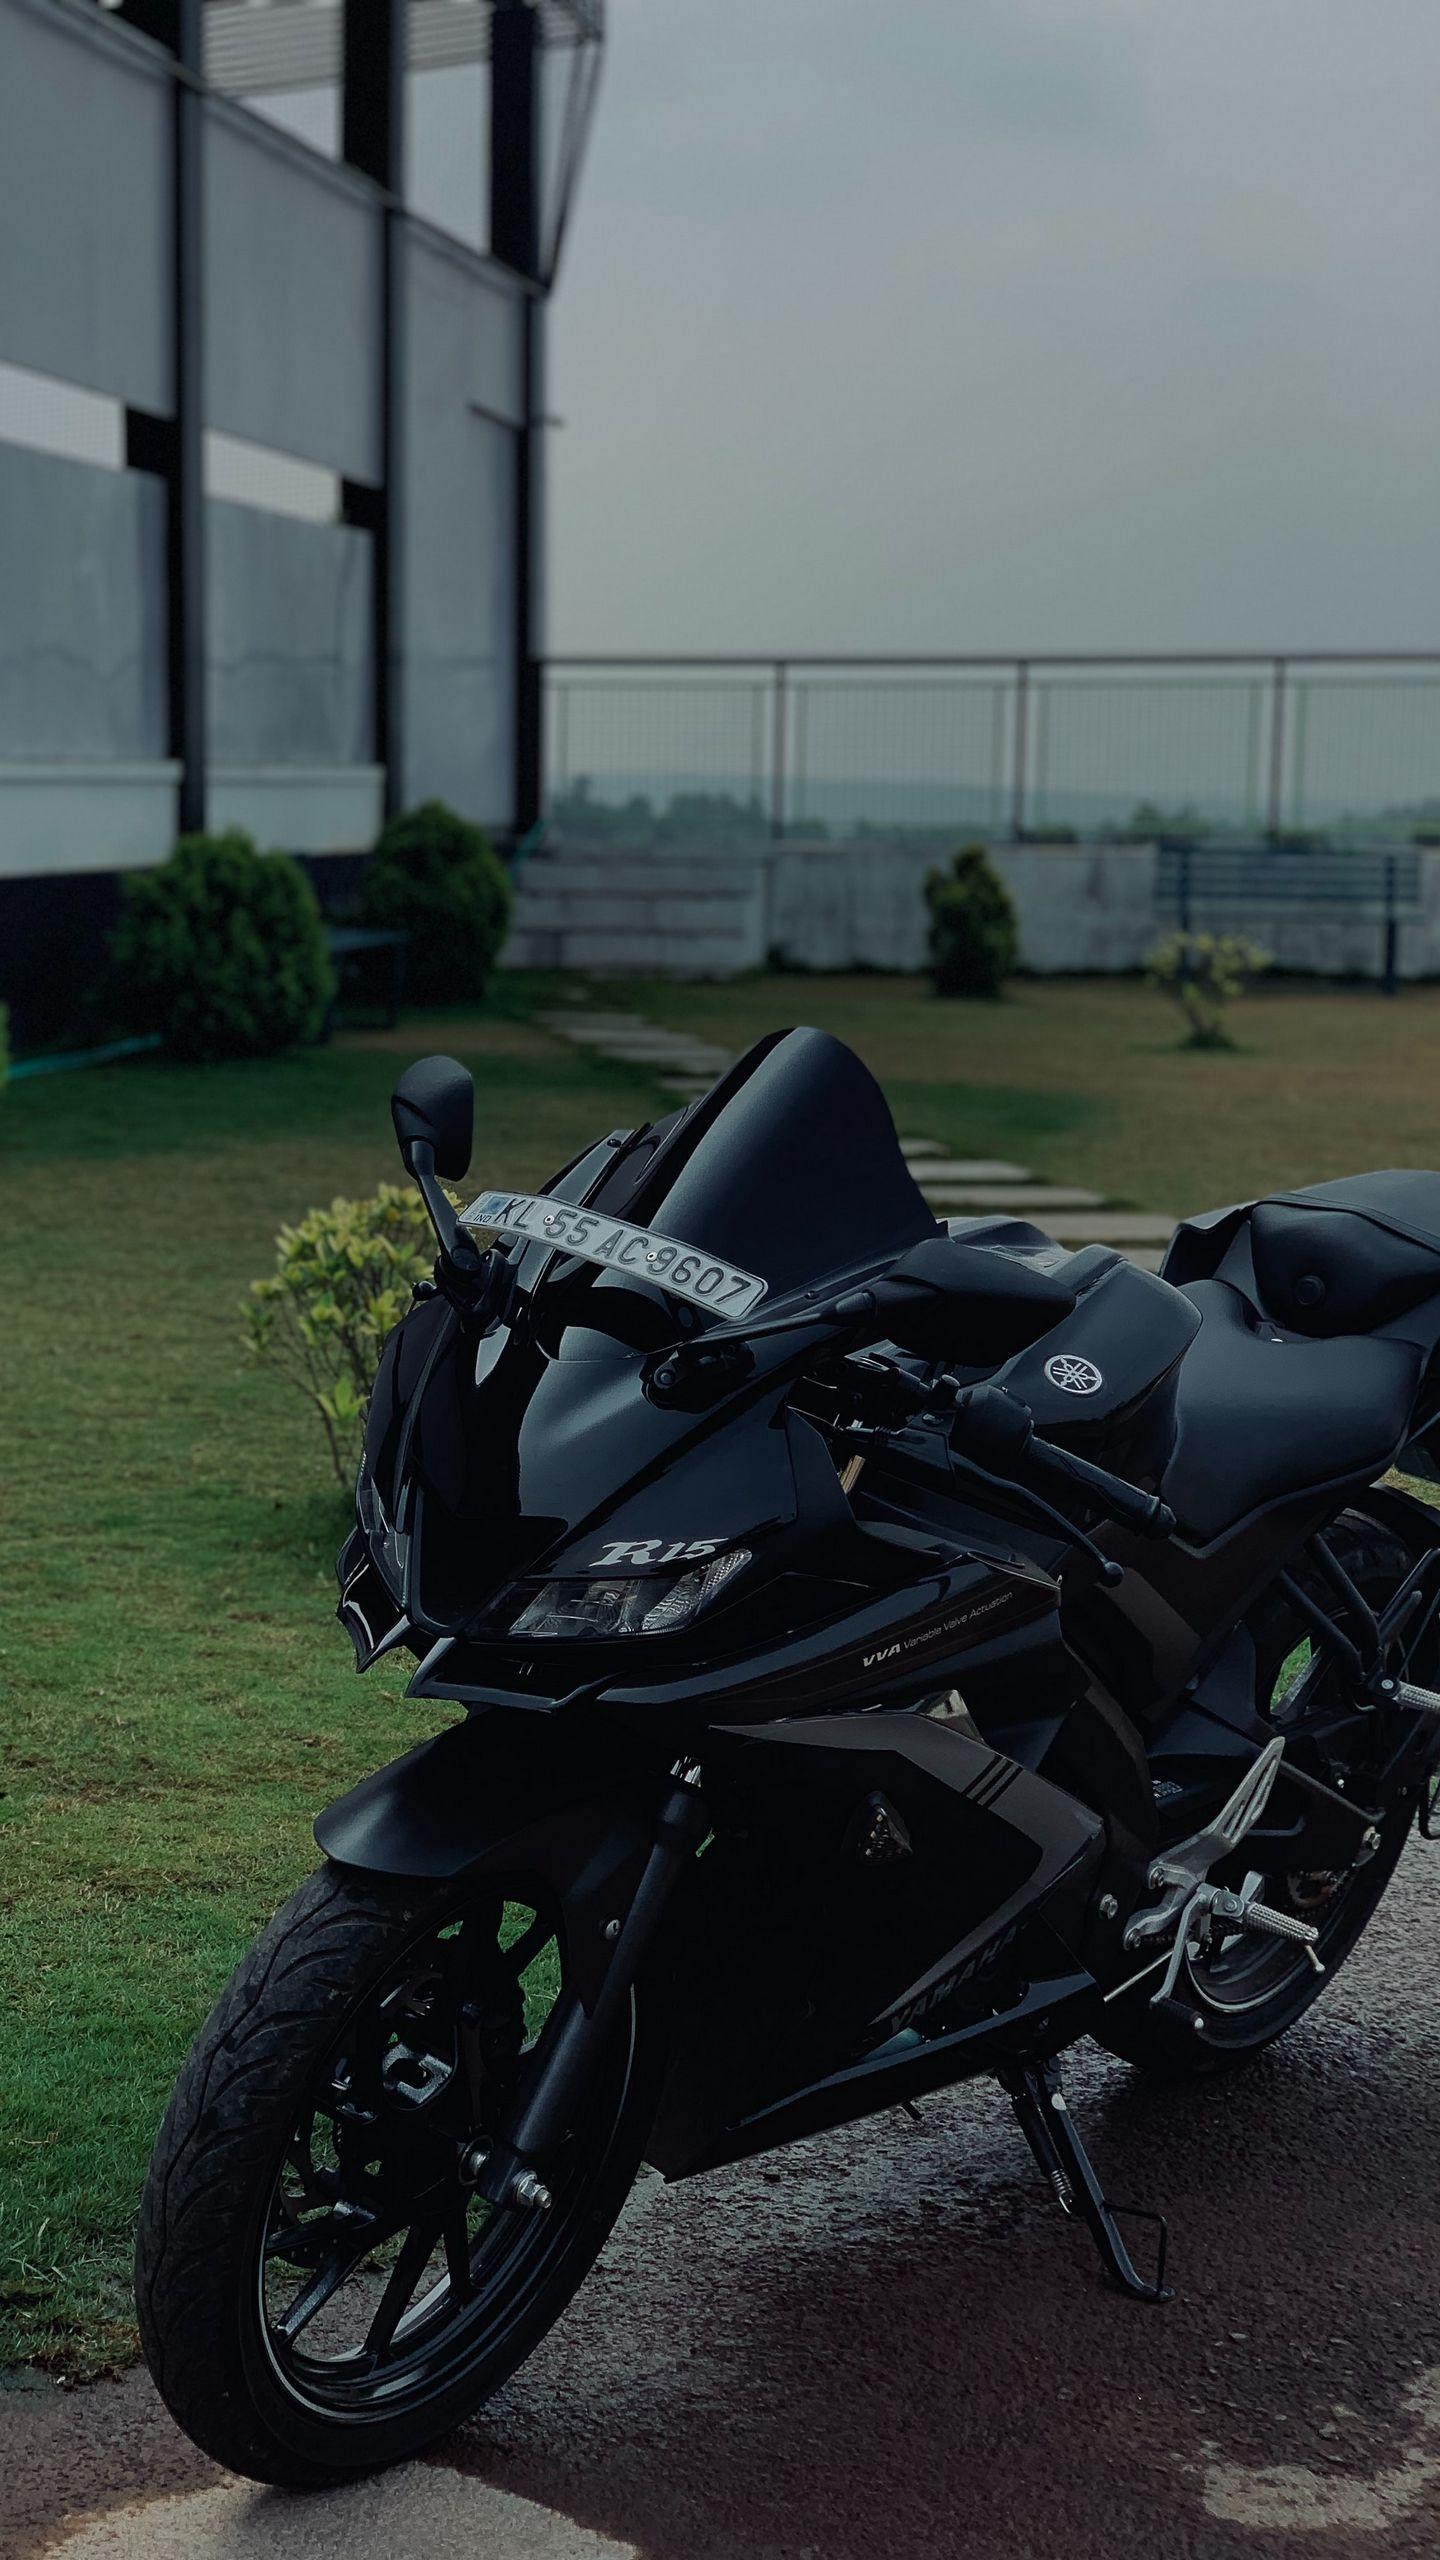 1440x2560 Wallpaper yamaha r15, yamaha, motorcycle, bike, black